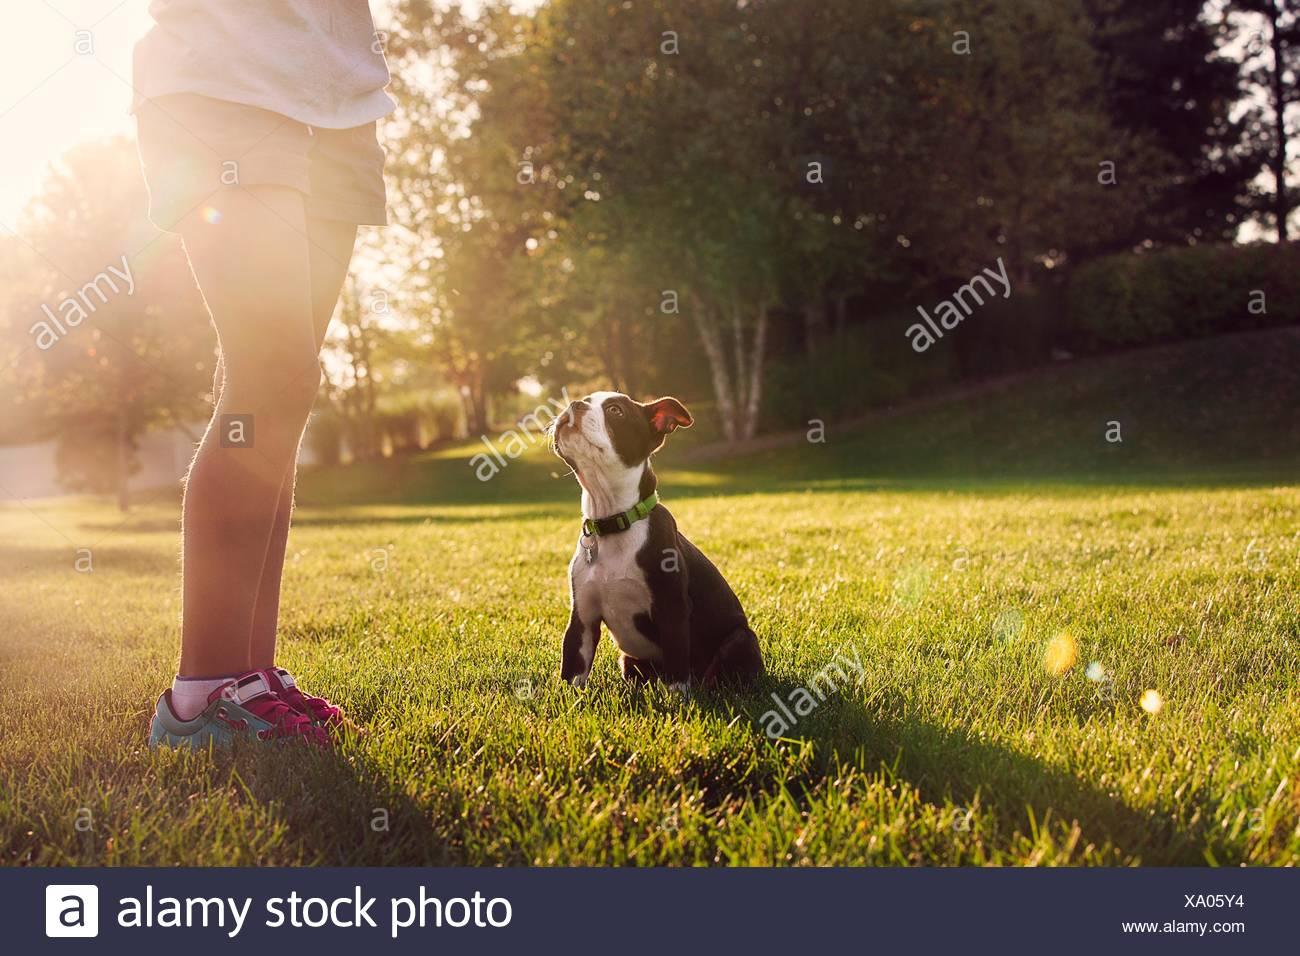 Taille abwärts von Mädchen Unterricht Boston Terrier Welpen sitzen Stockbild